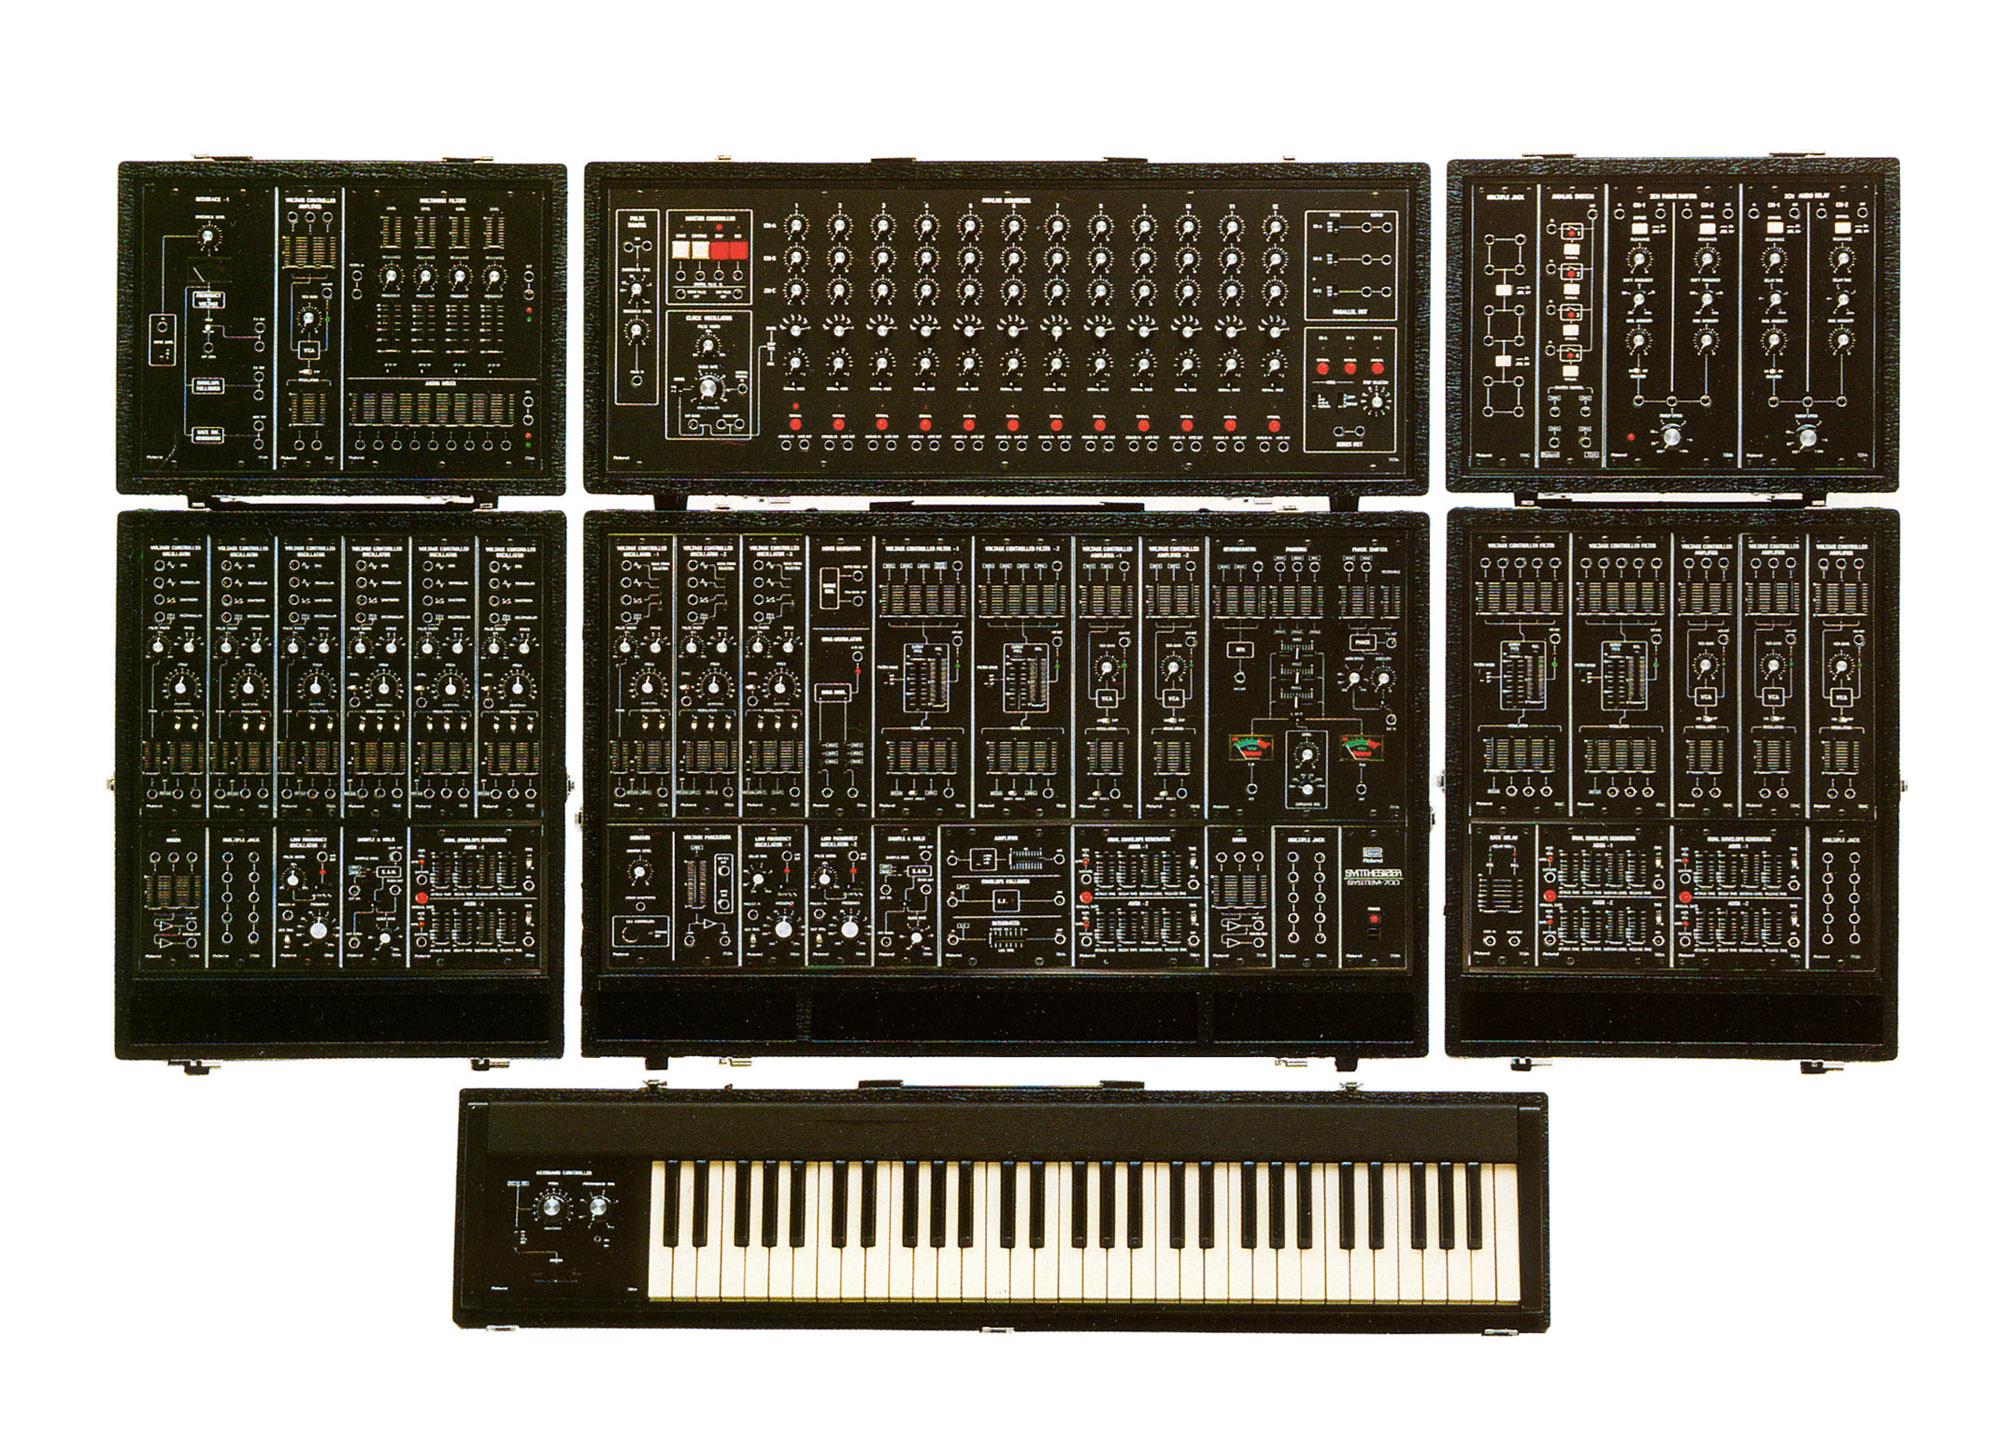 roland aira modular synthesizer system-700